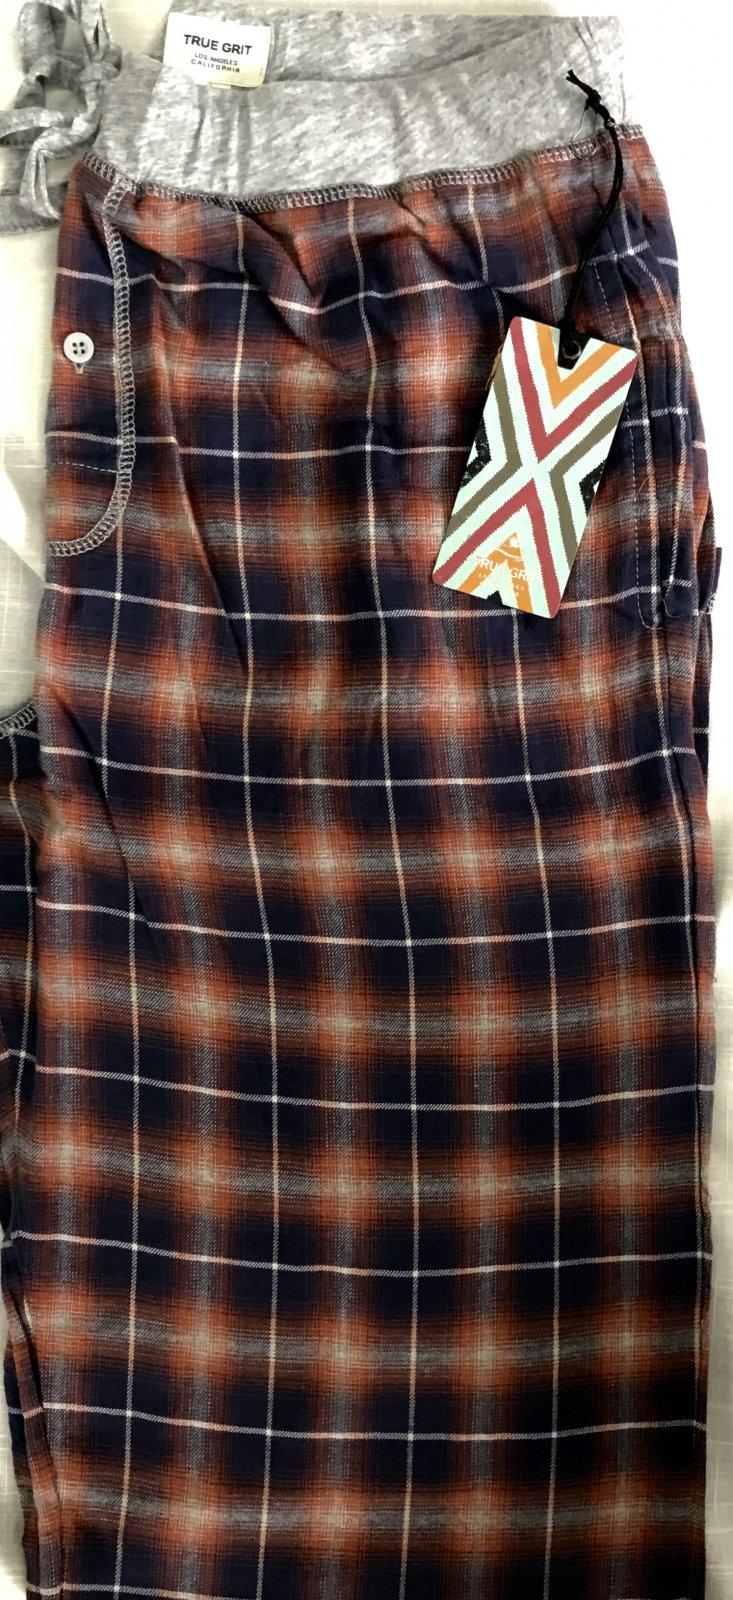 True Grit Crossroads Plaid Flannel Lounge Pant